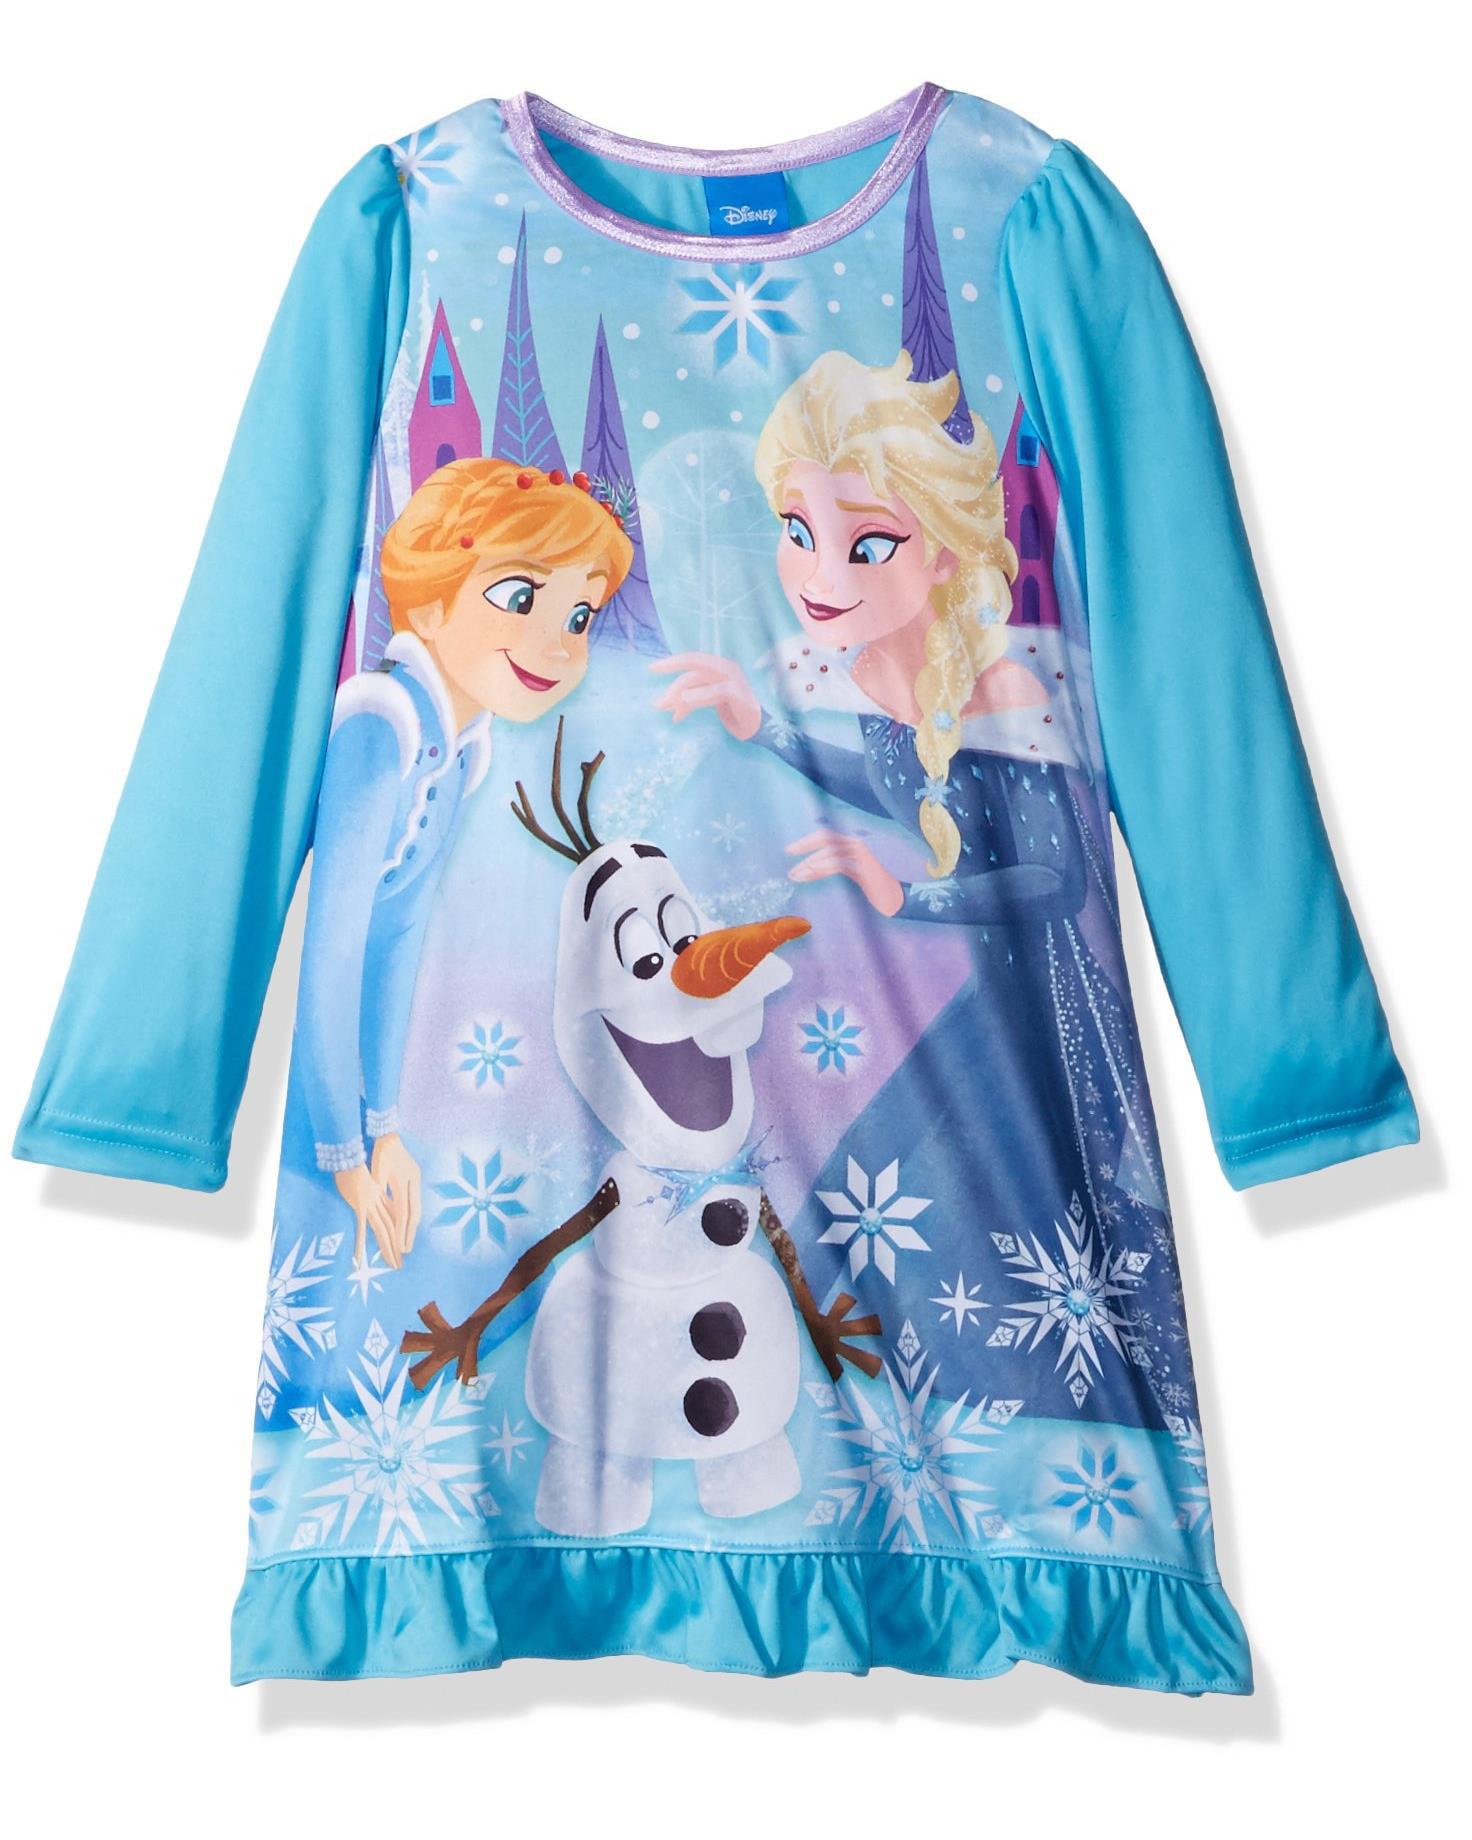 Disney Girls' Frozen Nightgown, Blue, Size: 6